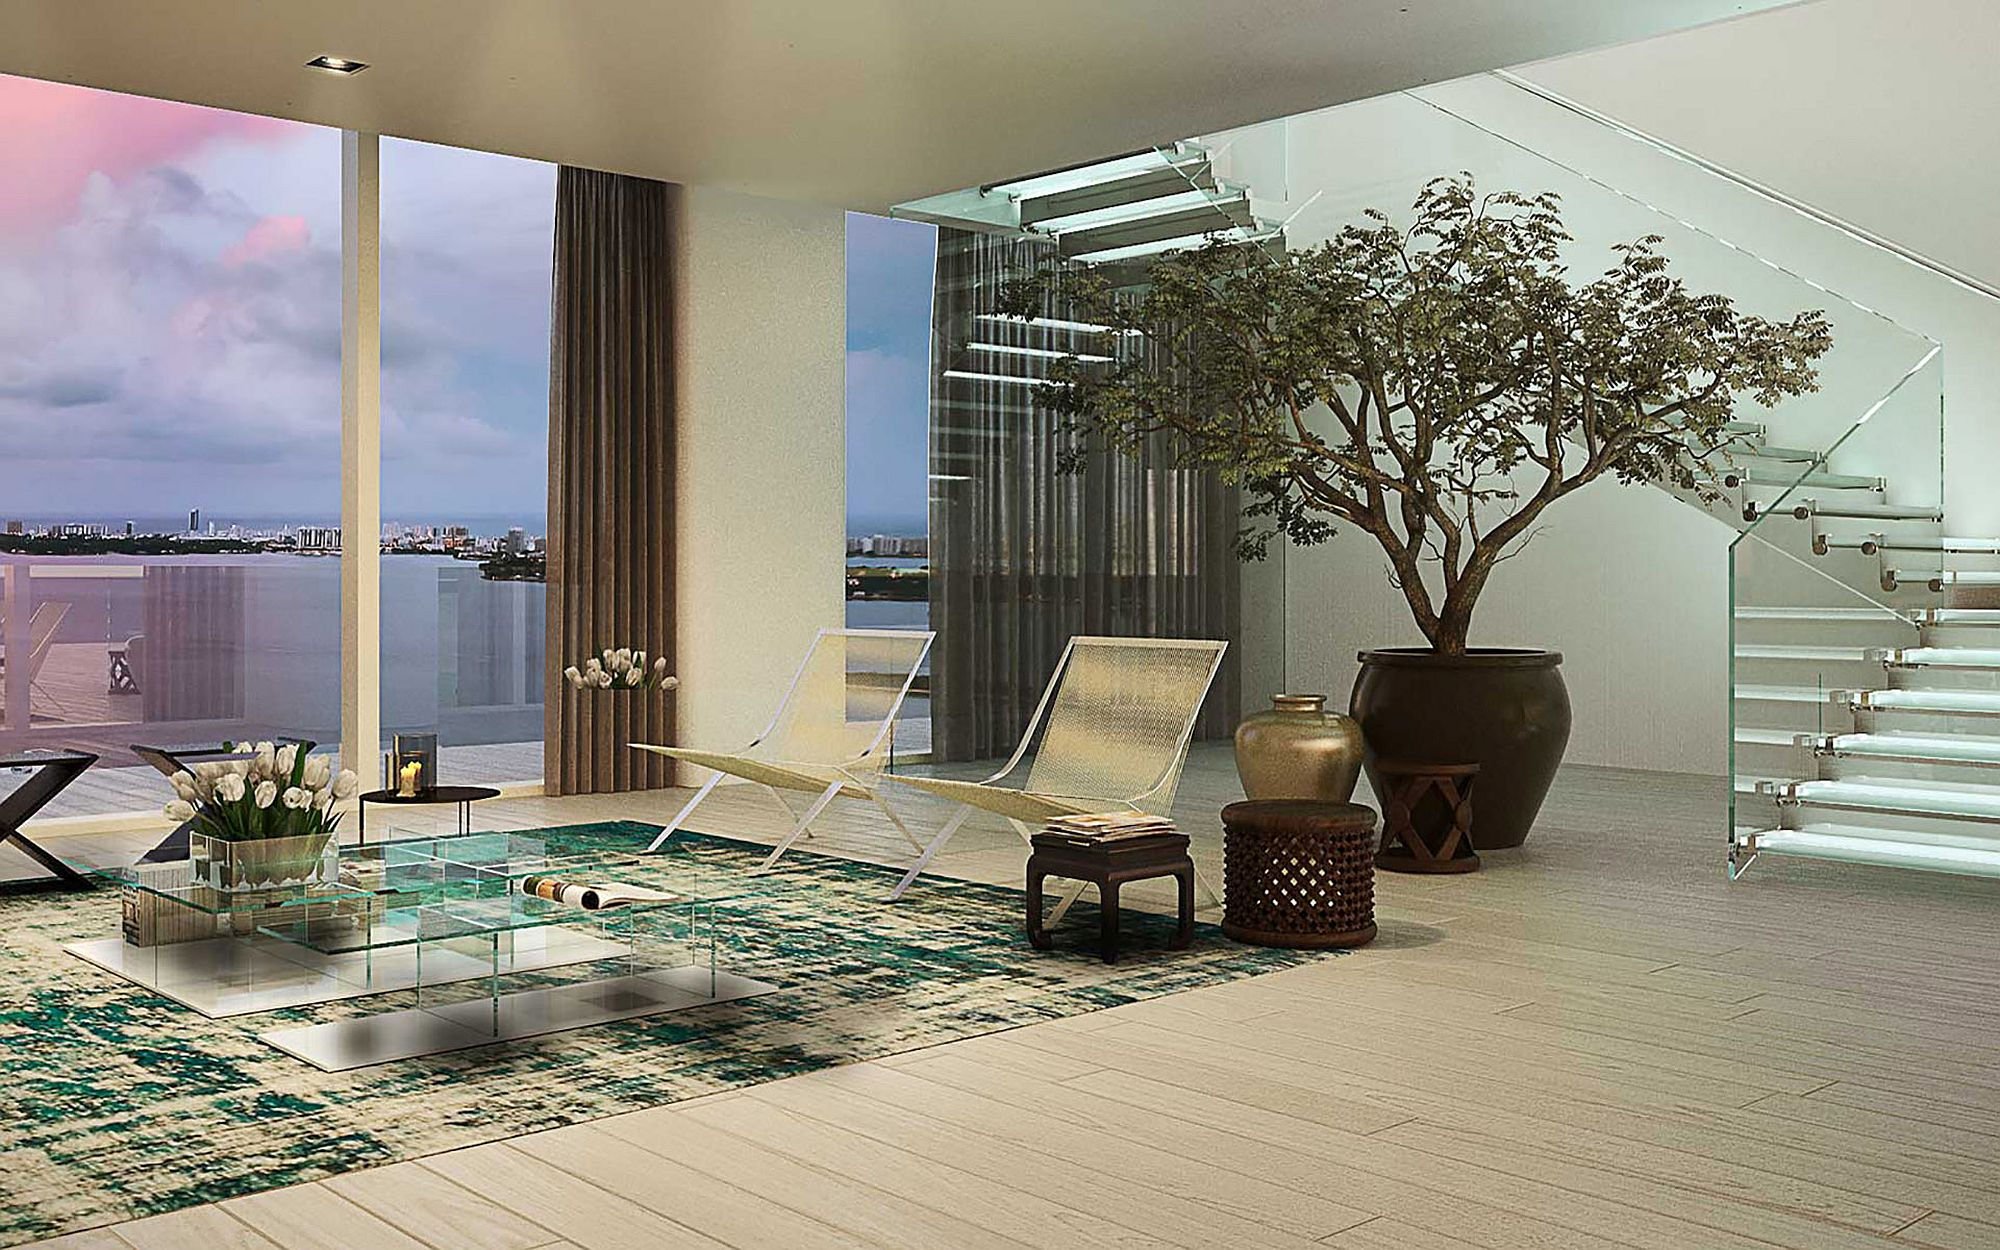 Luxurious interior of apartments at Auberge Miami